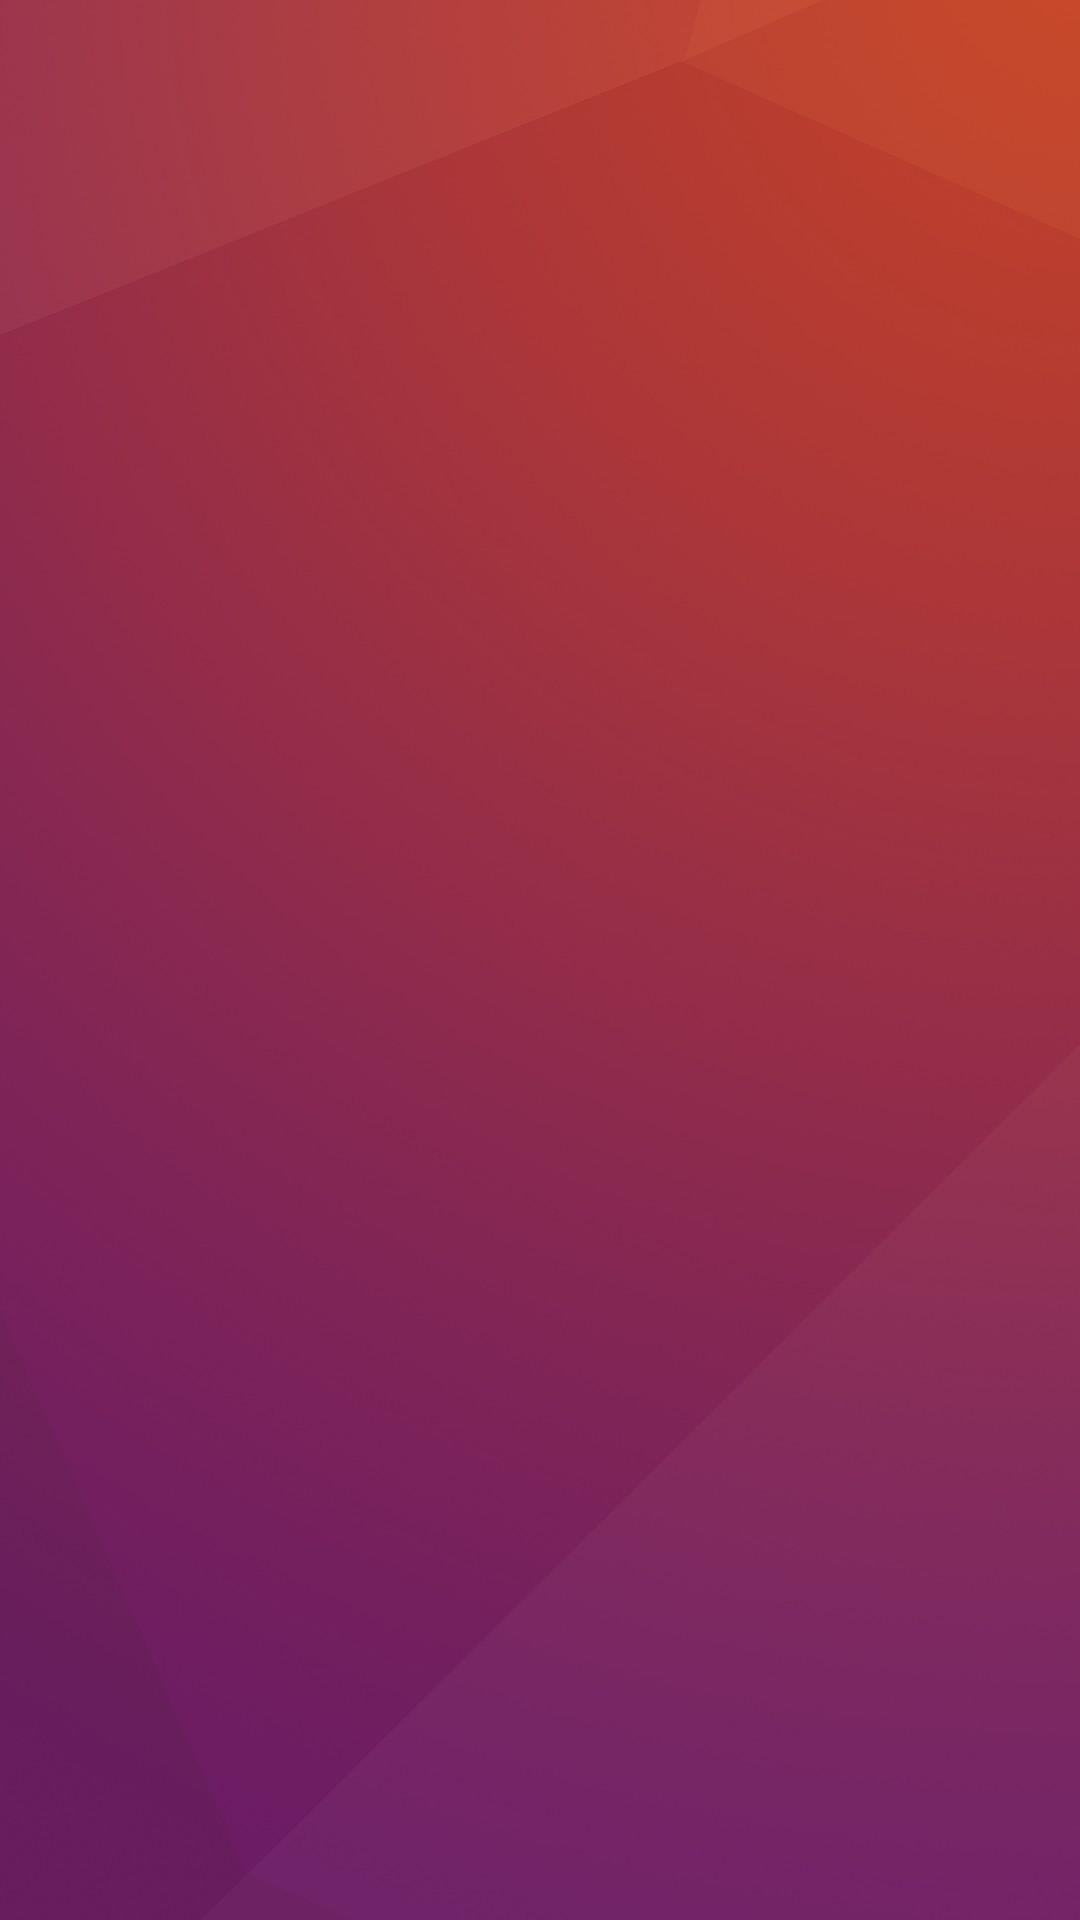 Ubuntu Wallpapers 3 Images